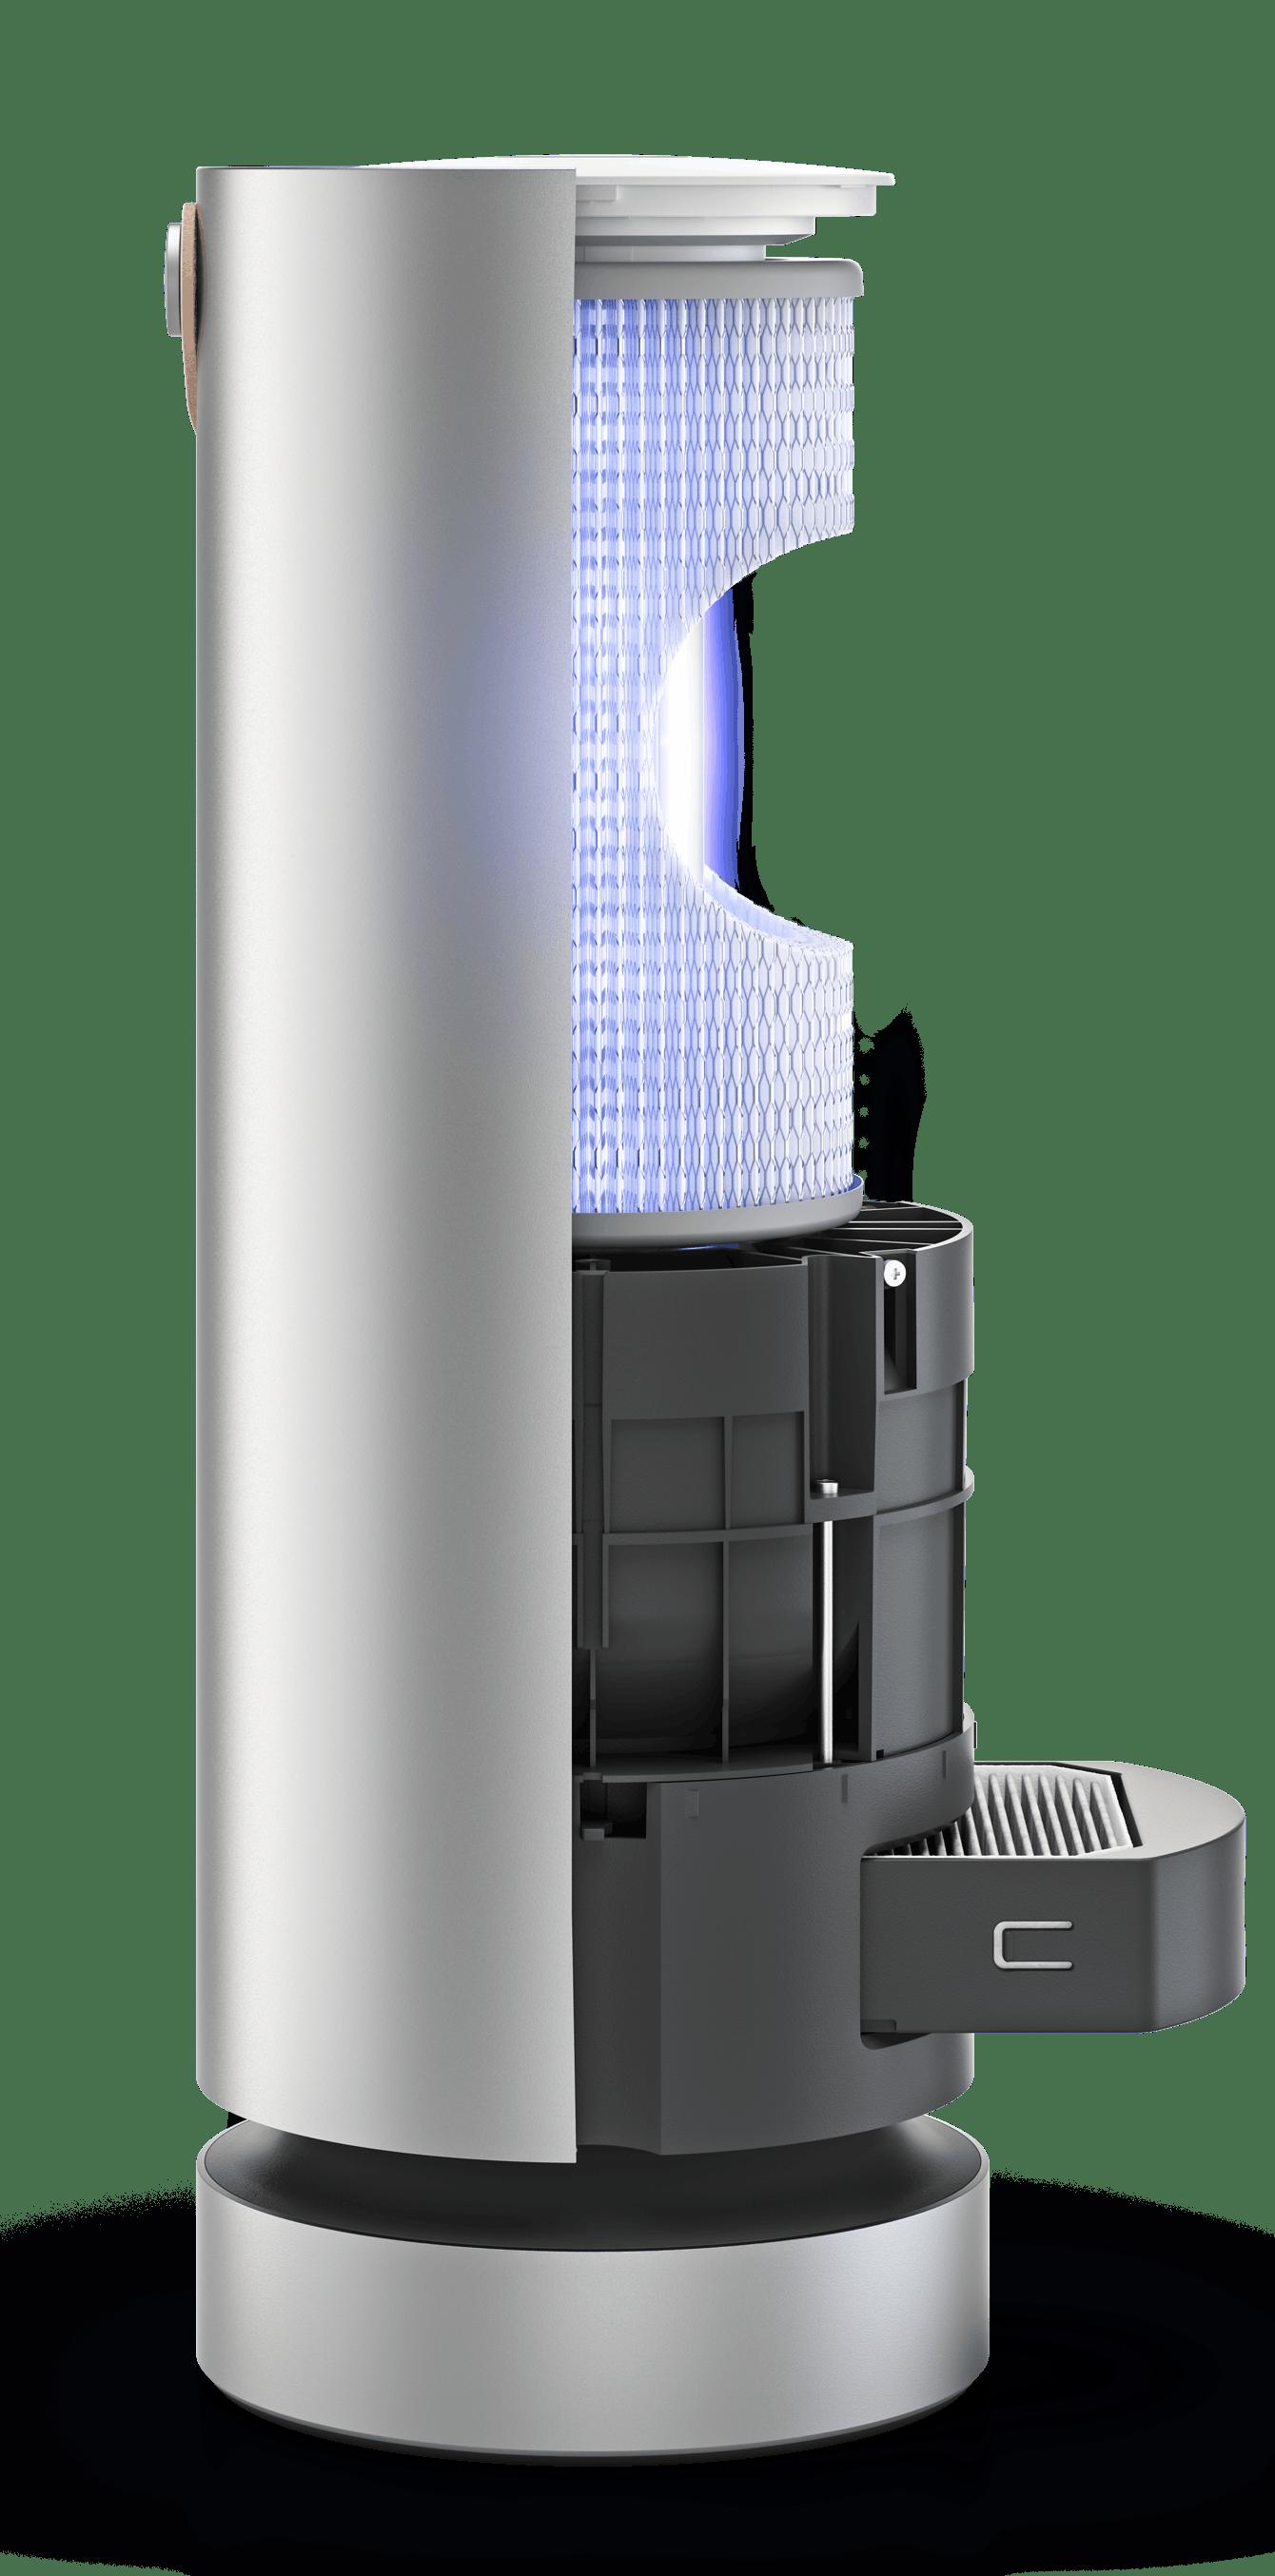 Molekule PECO Air Purification Technology in 2020 Air